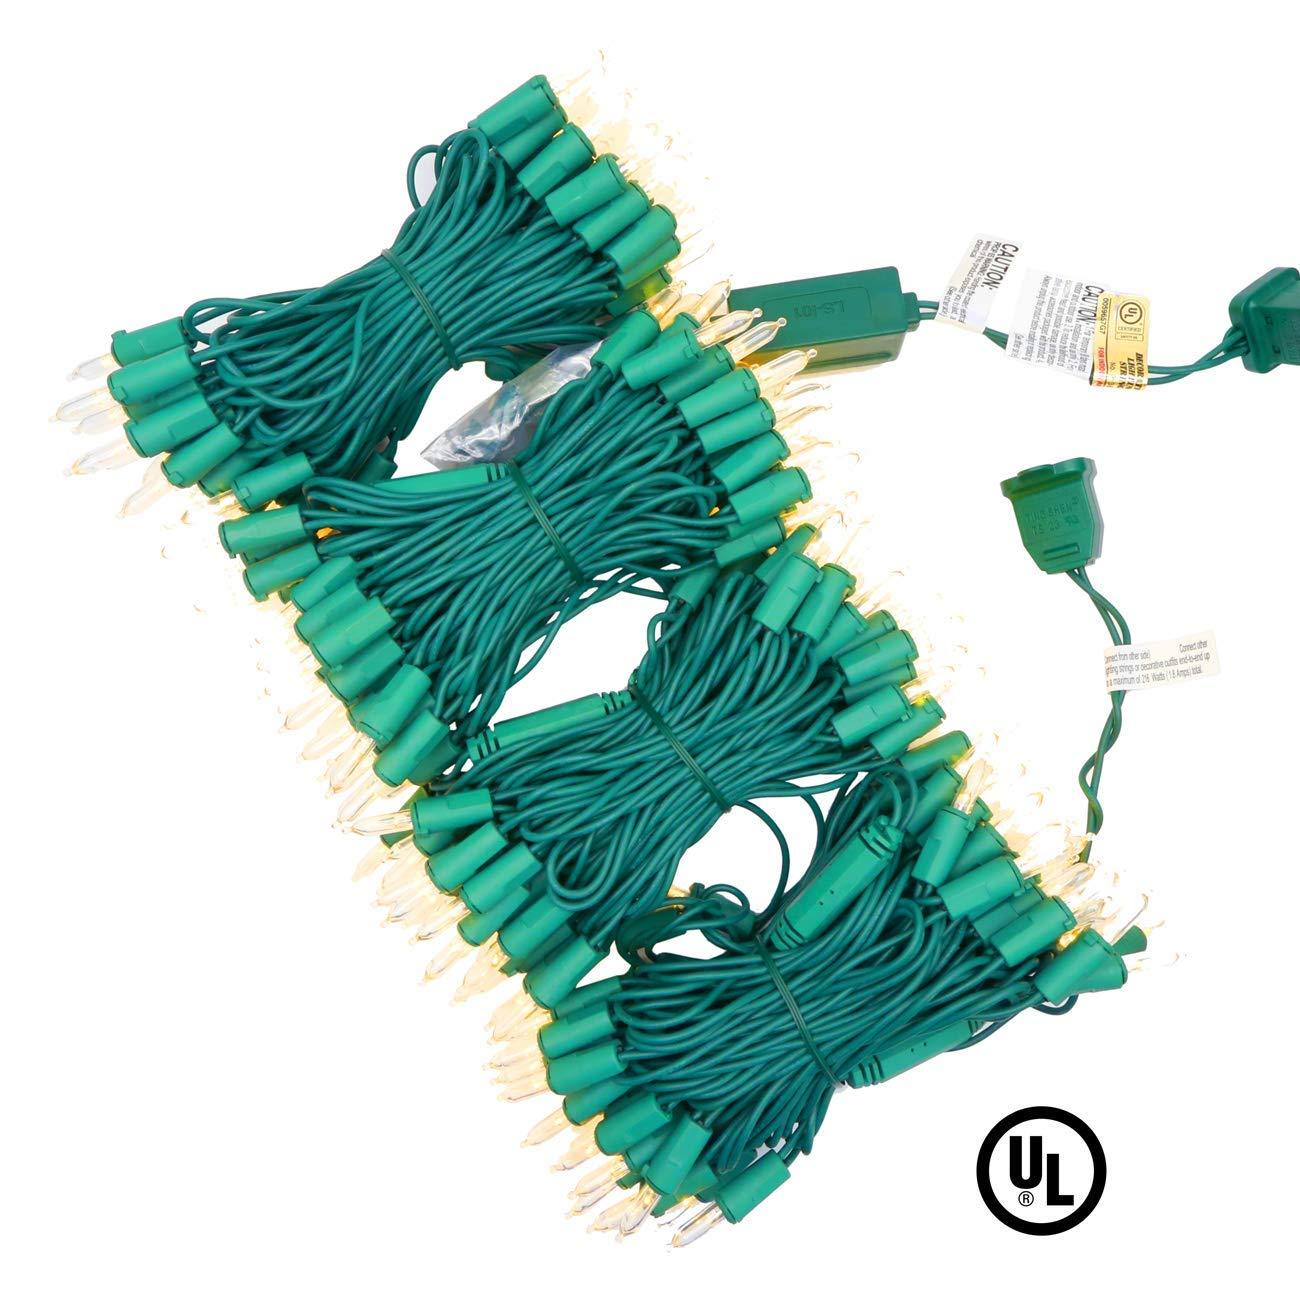 Commercial Grade Stay Lit Christmas String Lights, UL Certified 66Ft 200 LED Yuletide Decor Lights , Fairy Lights for Christmas Tree Garden Home Decor, Warm White(Sunshine) Green Wire (M4 LED Bulbs)